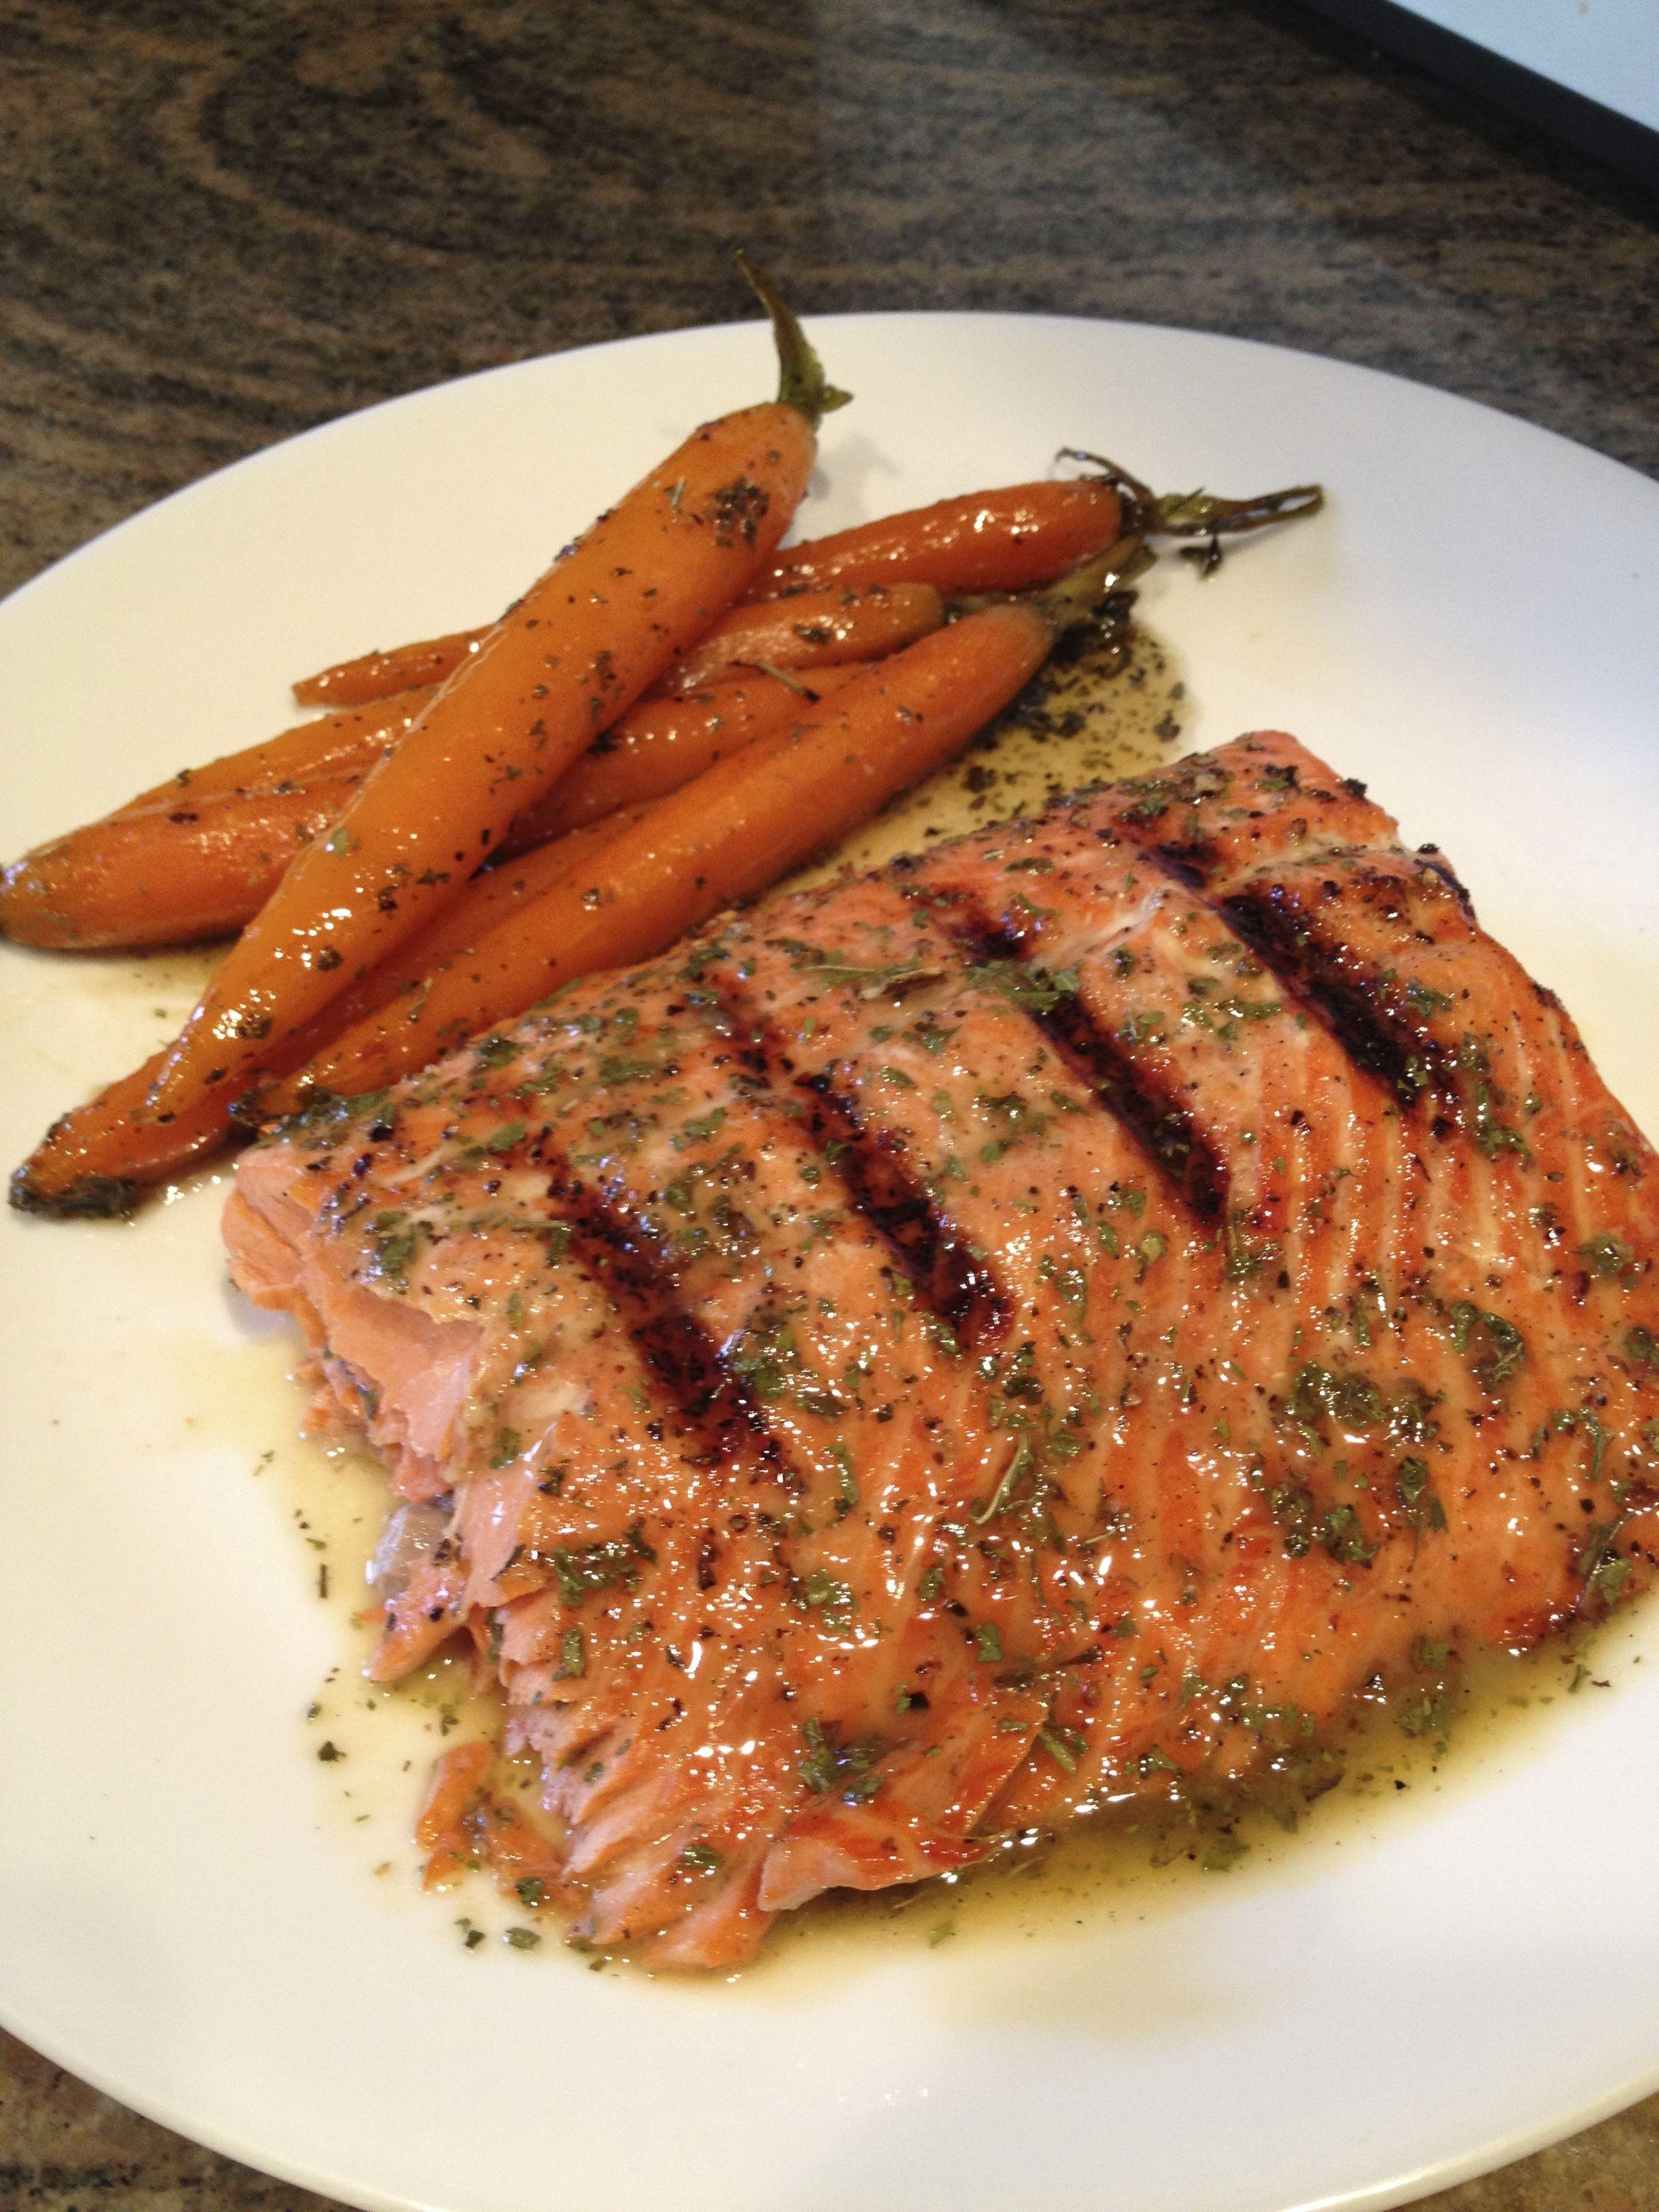 Grilled Amp Glazed Wild Copper River Sockeye Salmon Keviniscooking Com Sockeye Salmon Recipes